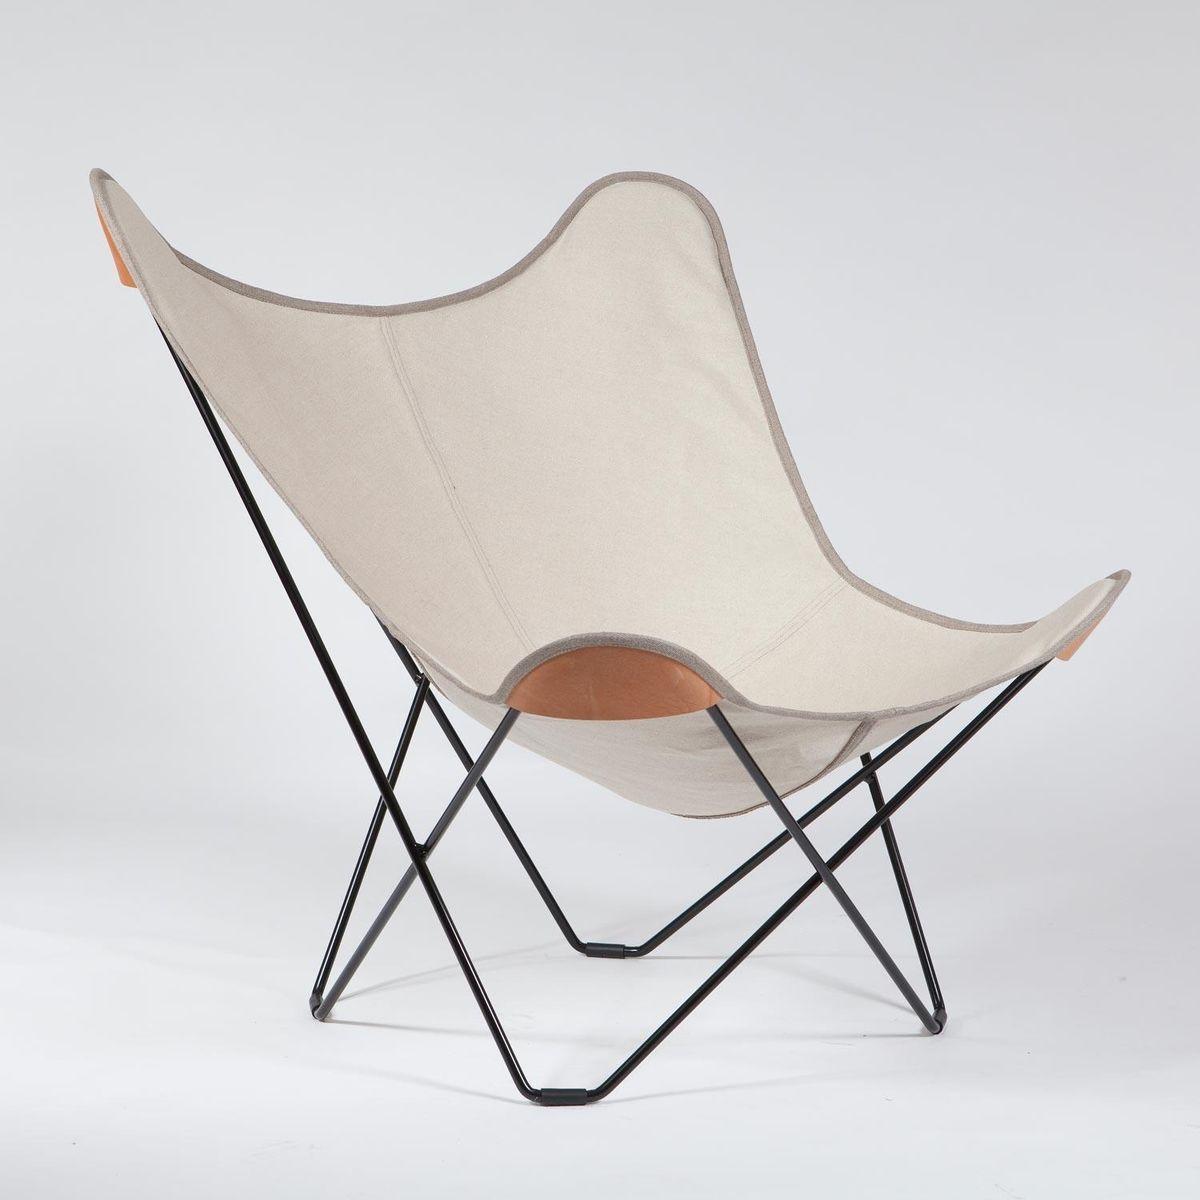 cuero Canvas Mariposa Butterfly Chair natural frame